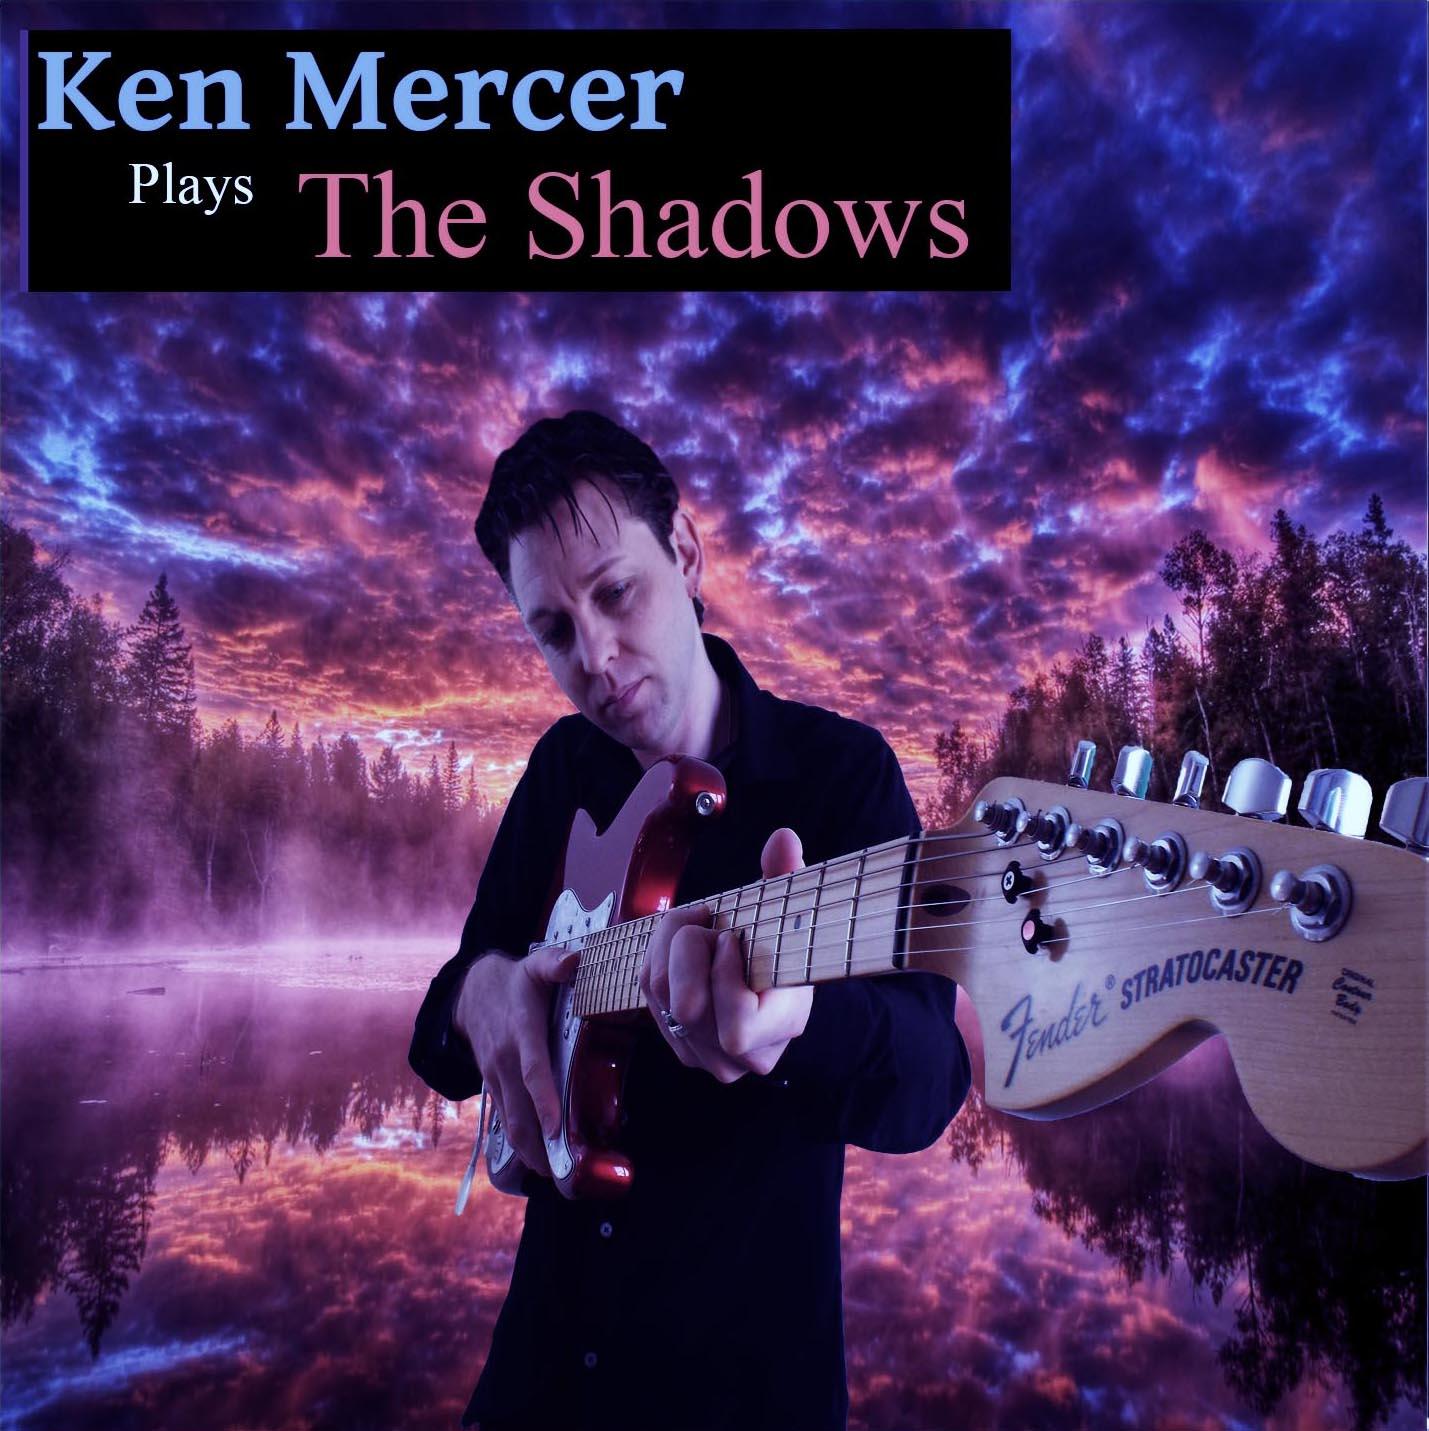 Ken Mercer Plays The Shadows